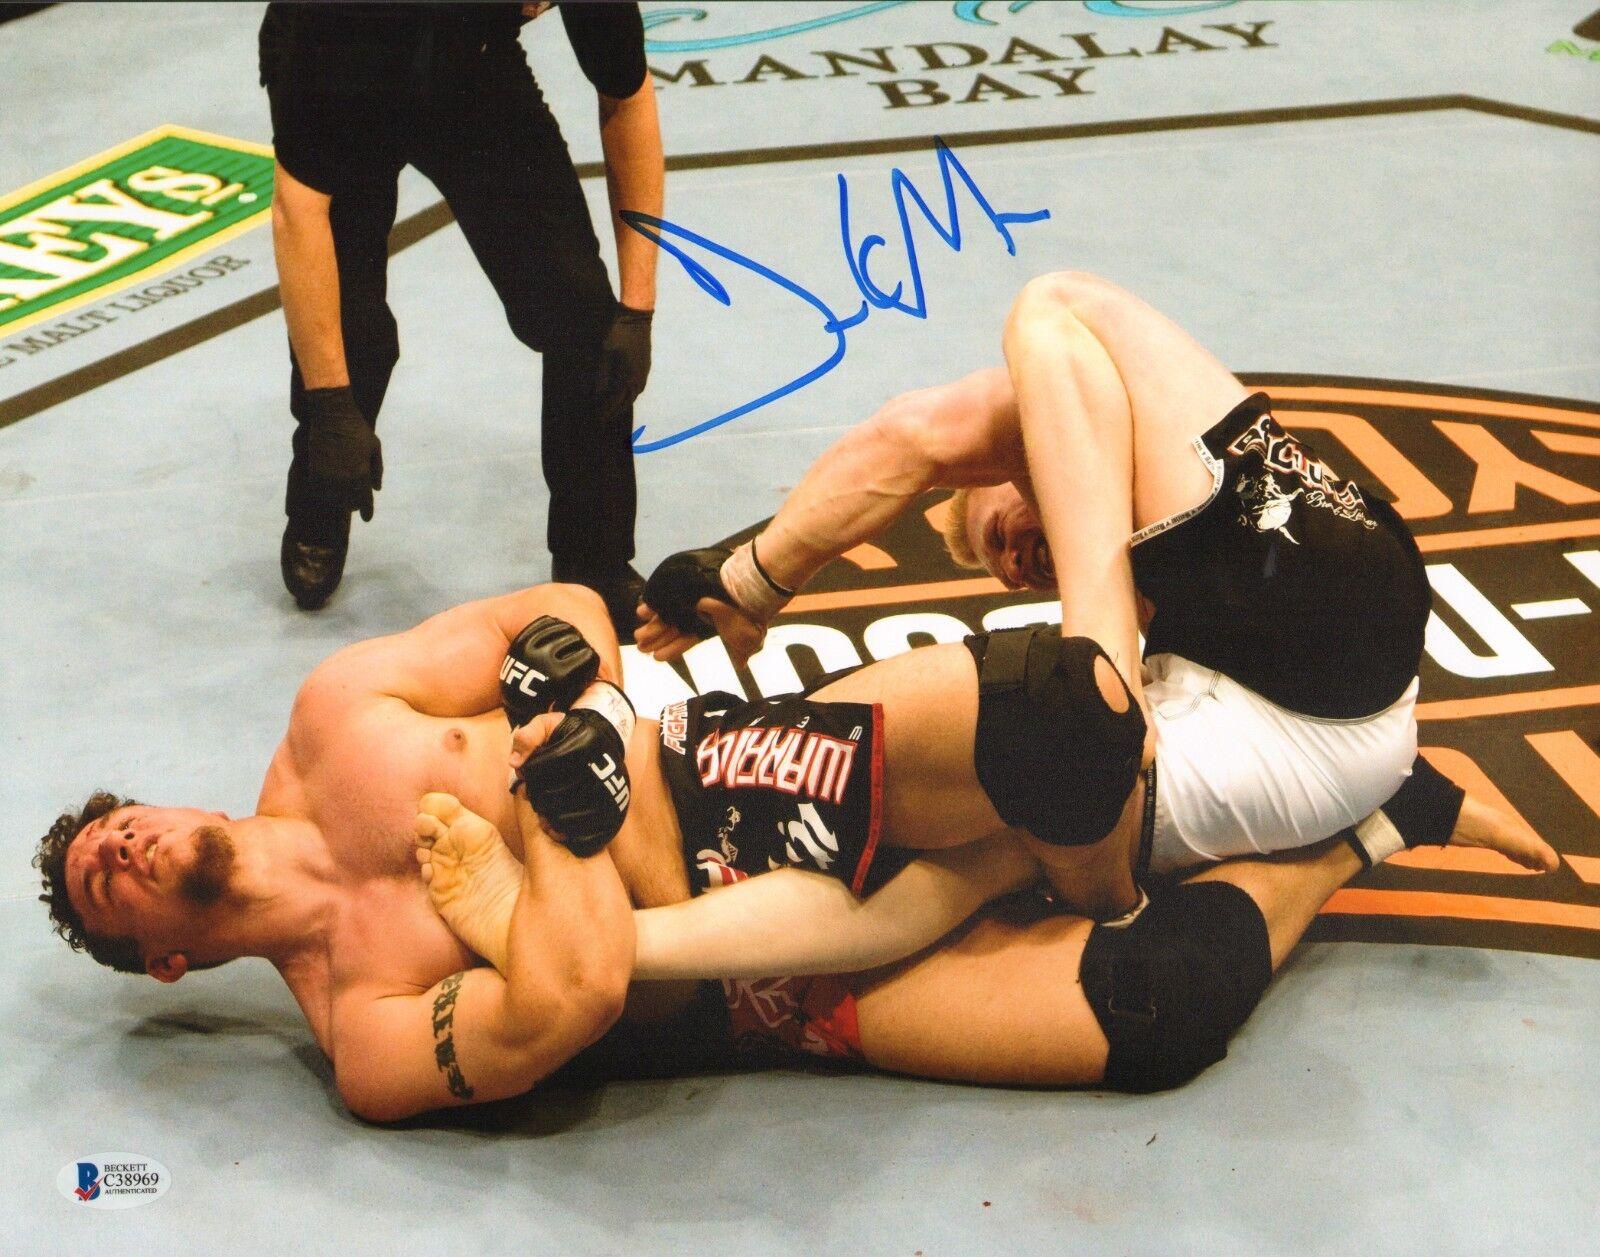 Frank Mir Firmado 11x14 Foto Bas Beckett COA UFC 81 Brock Lesnar Submission 2008